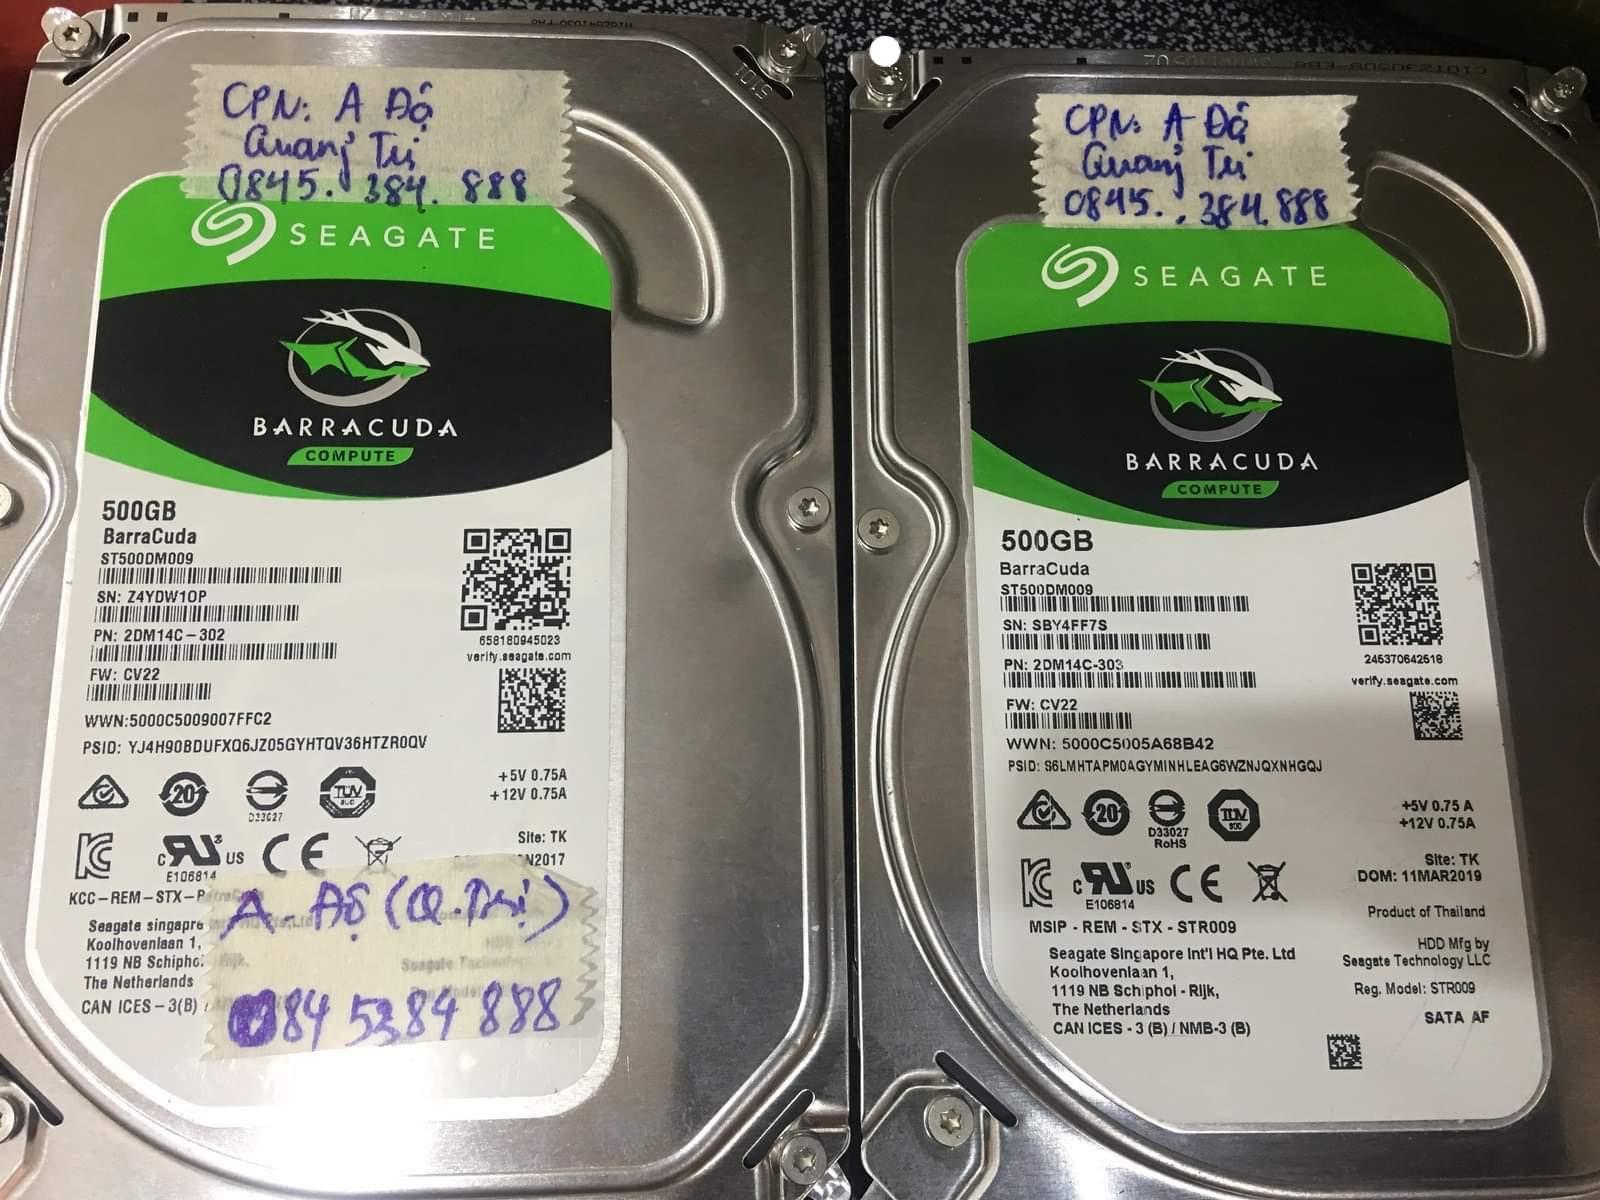 Cứu dữ liệu ổ cứng Seagate 500GB lỗi đầu đọc tại Quảng Trị 06/07/2020 - cuumaytinh